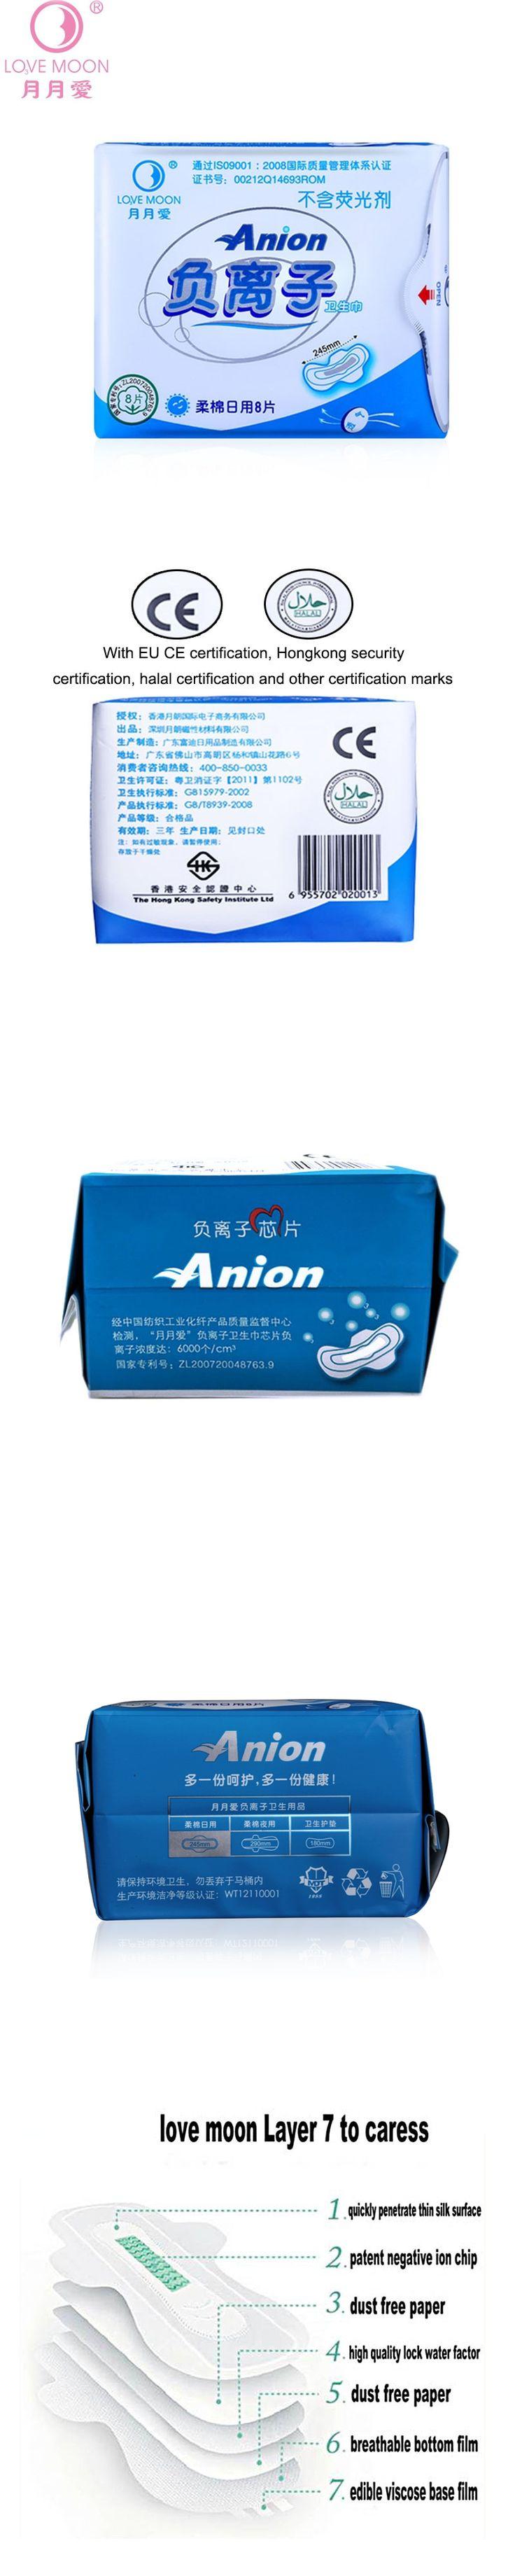 1Pcs+storage bag Sanitary Pads Anion Pads Feminine Hygiene Sanitary Napkin Organic Cotton Winalite Lovemoon Safety Sterilization